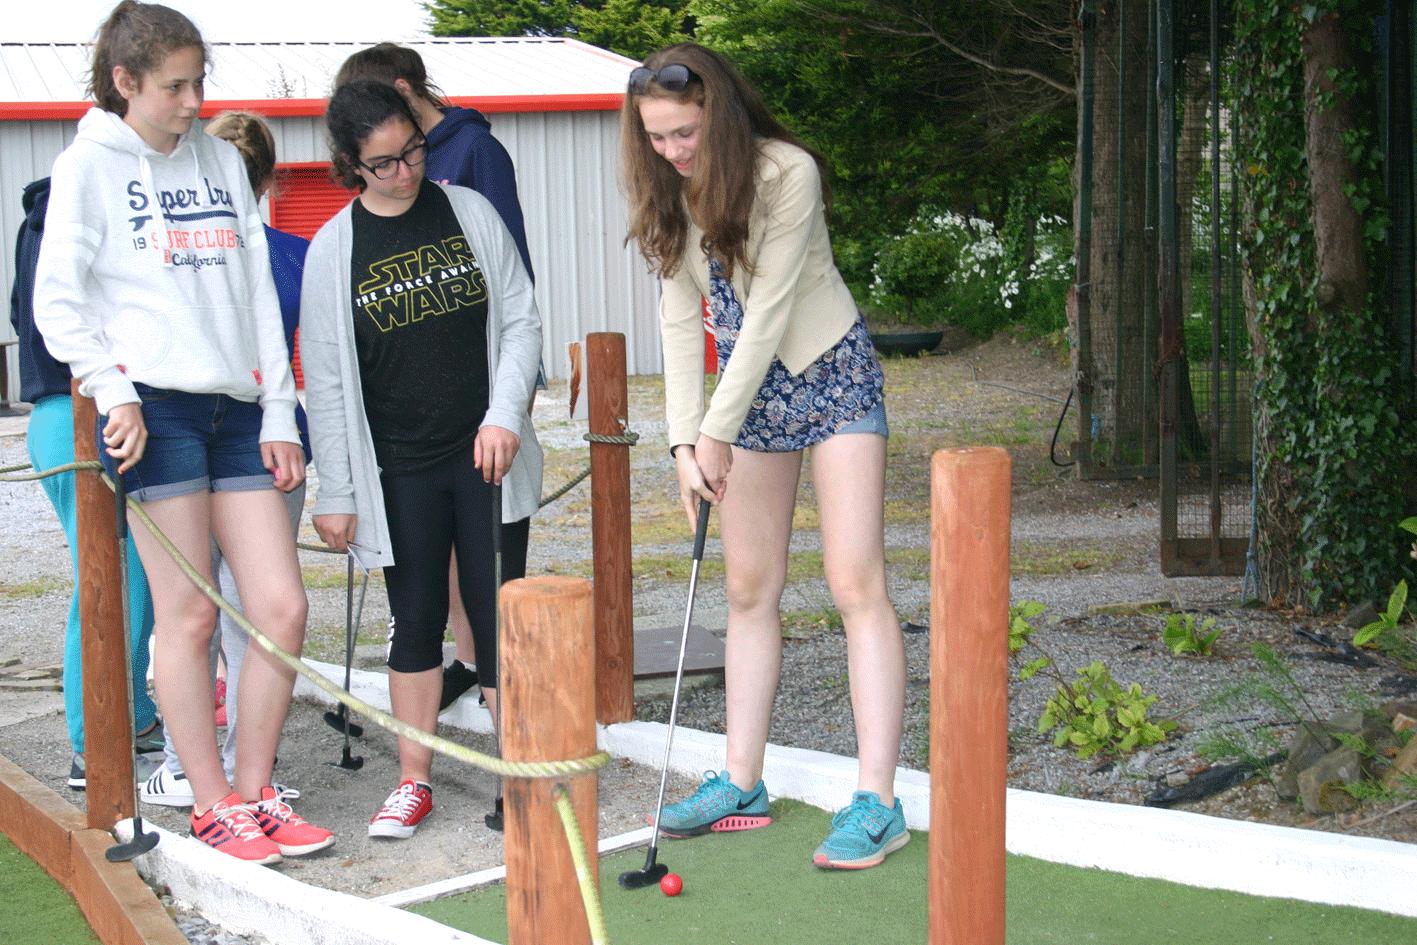 Ecole de mer mini golf minigolf